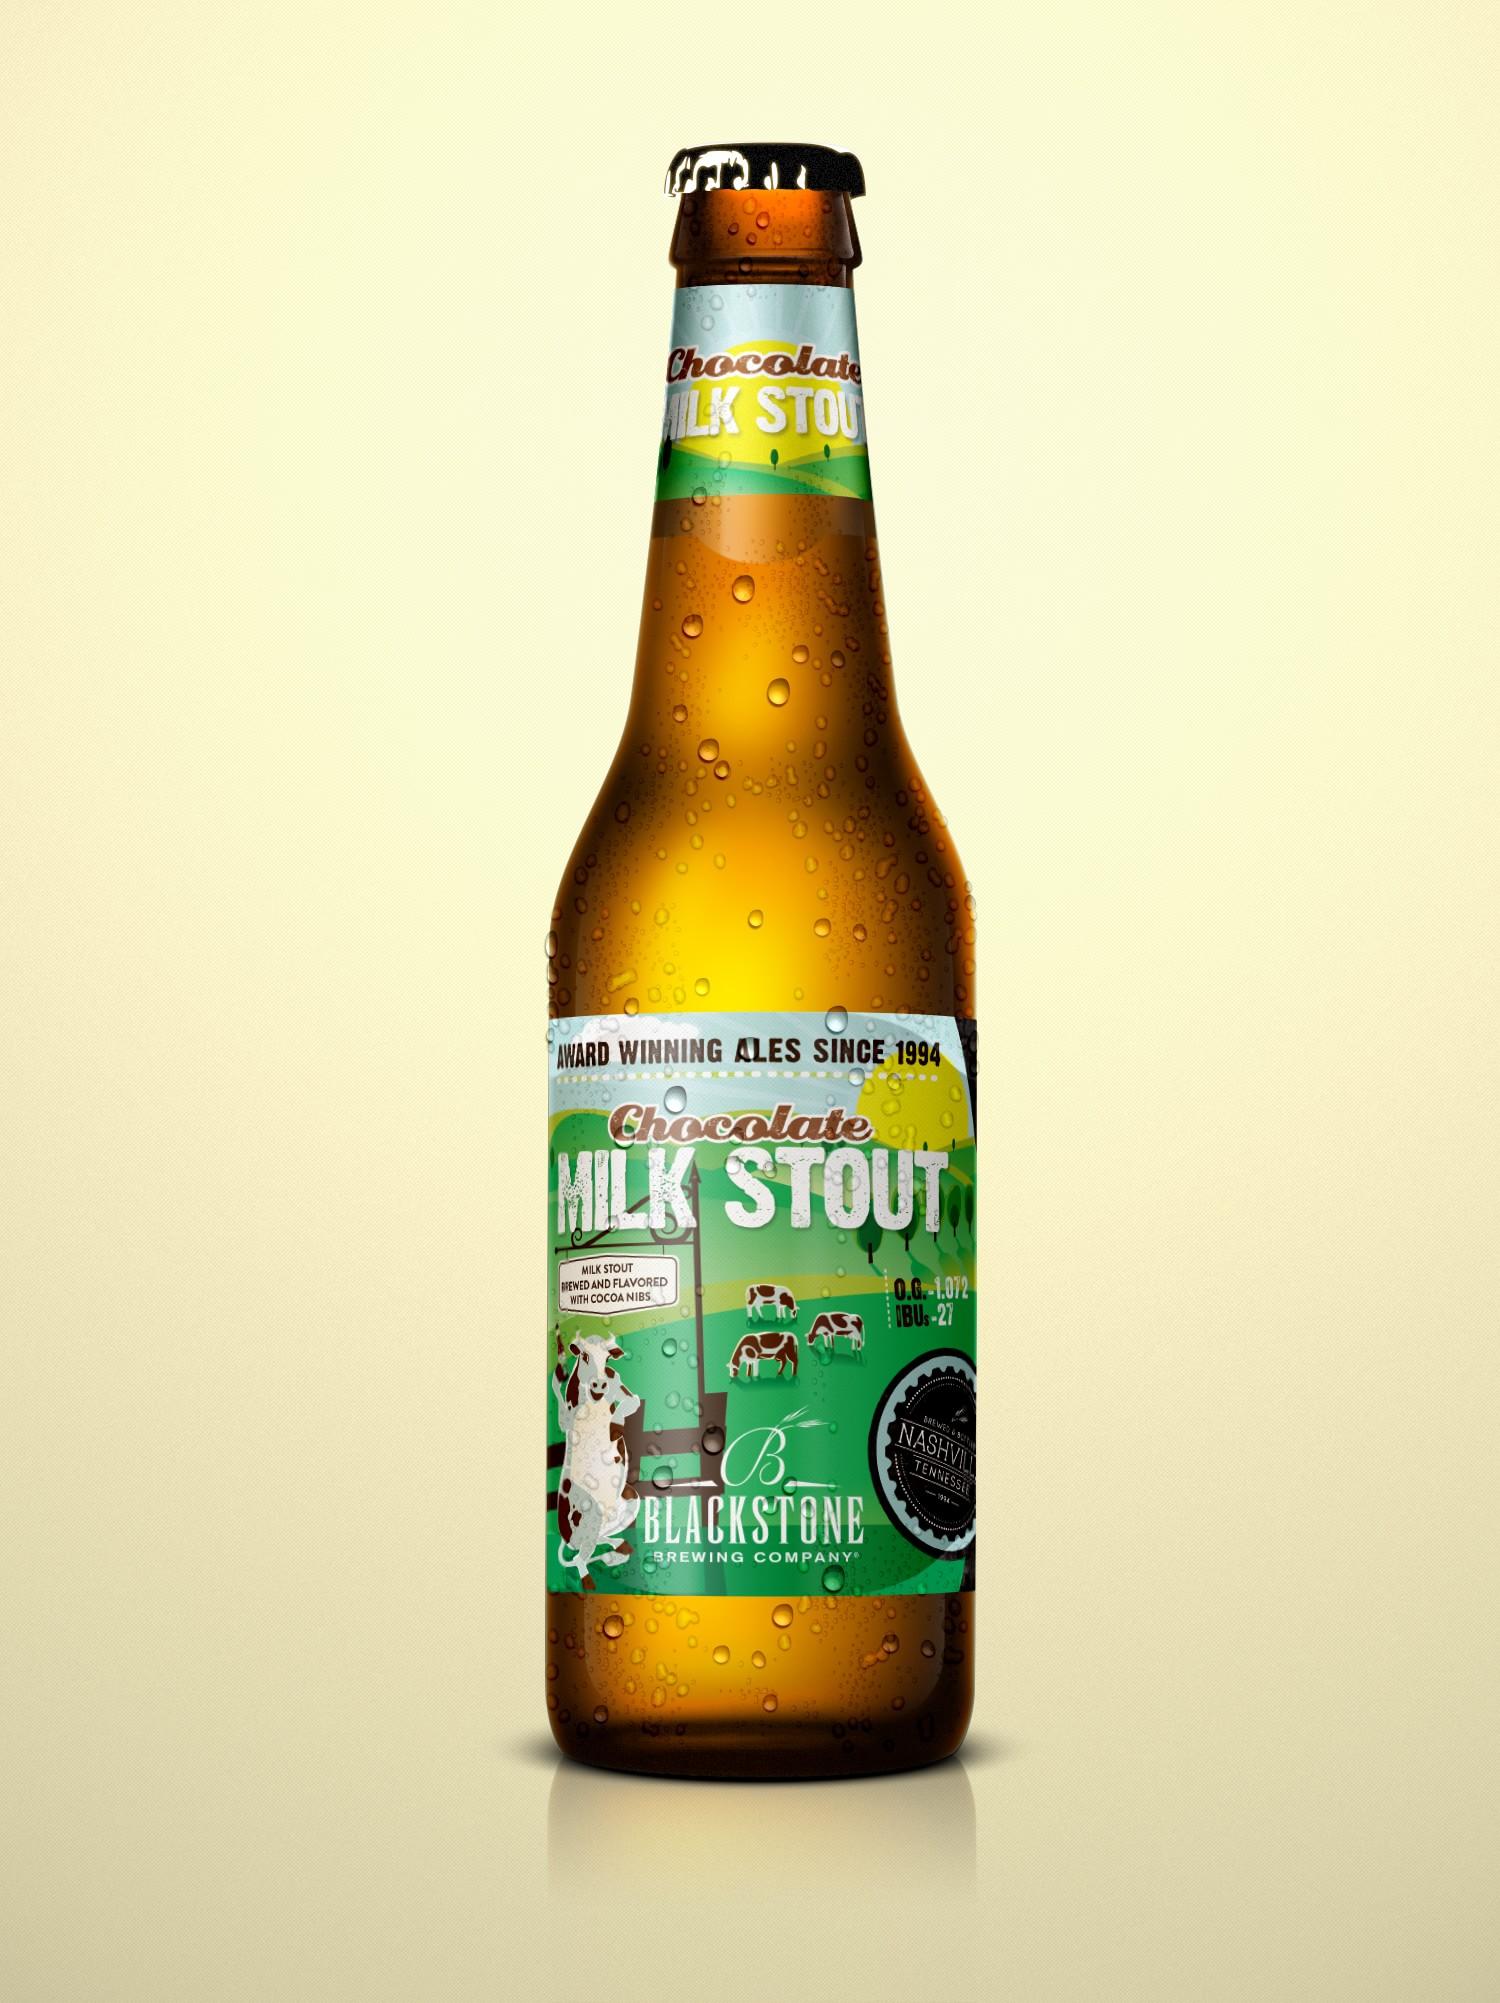 Blackstone Brewing Company Milk Stout Bottle Label